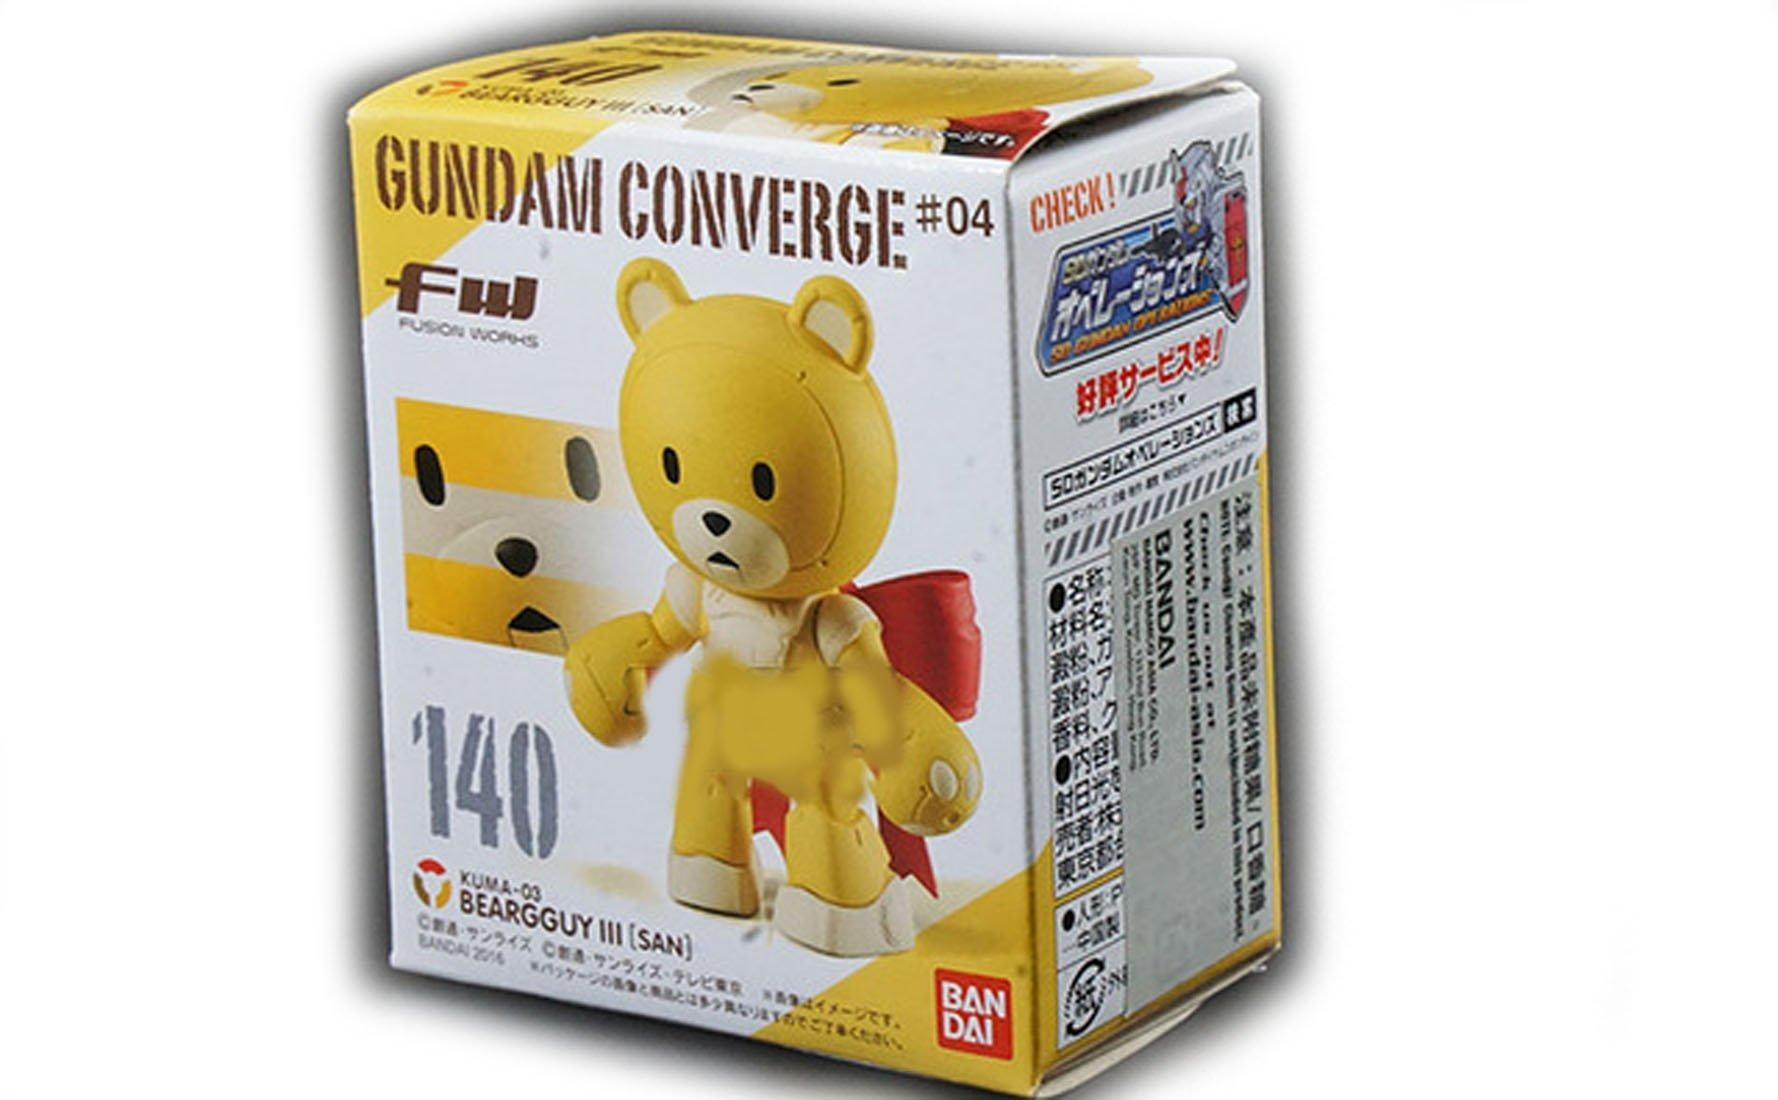 Bandai FW Fusion Works Shokugan Gundam Converge #04 Beargguy III San #140 Figure by Bandai